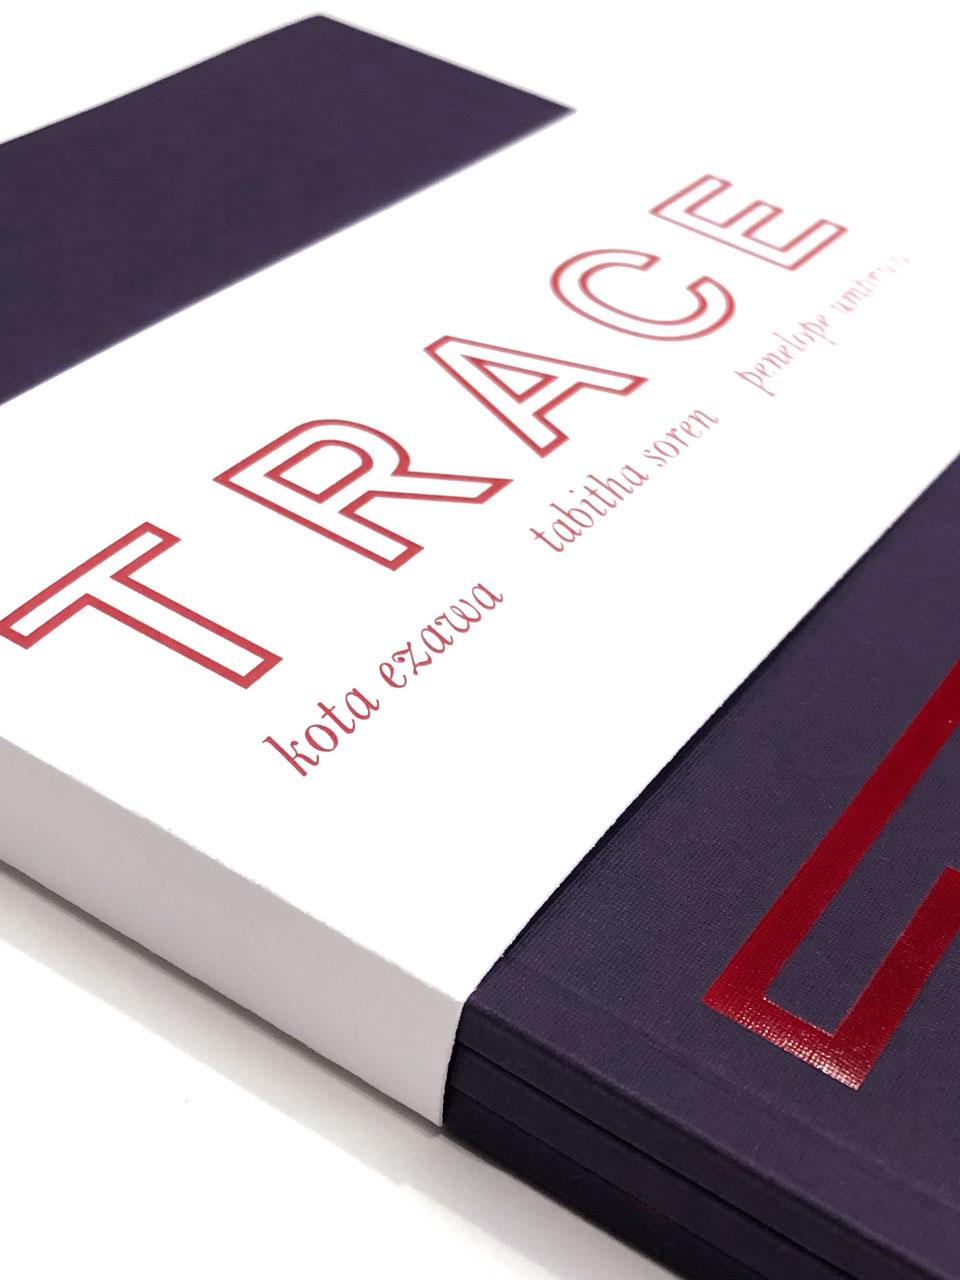 TRACE  by Tabitha Soren, Kota Ezawa and Penelope Umbrico